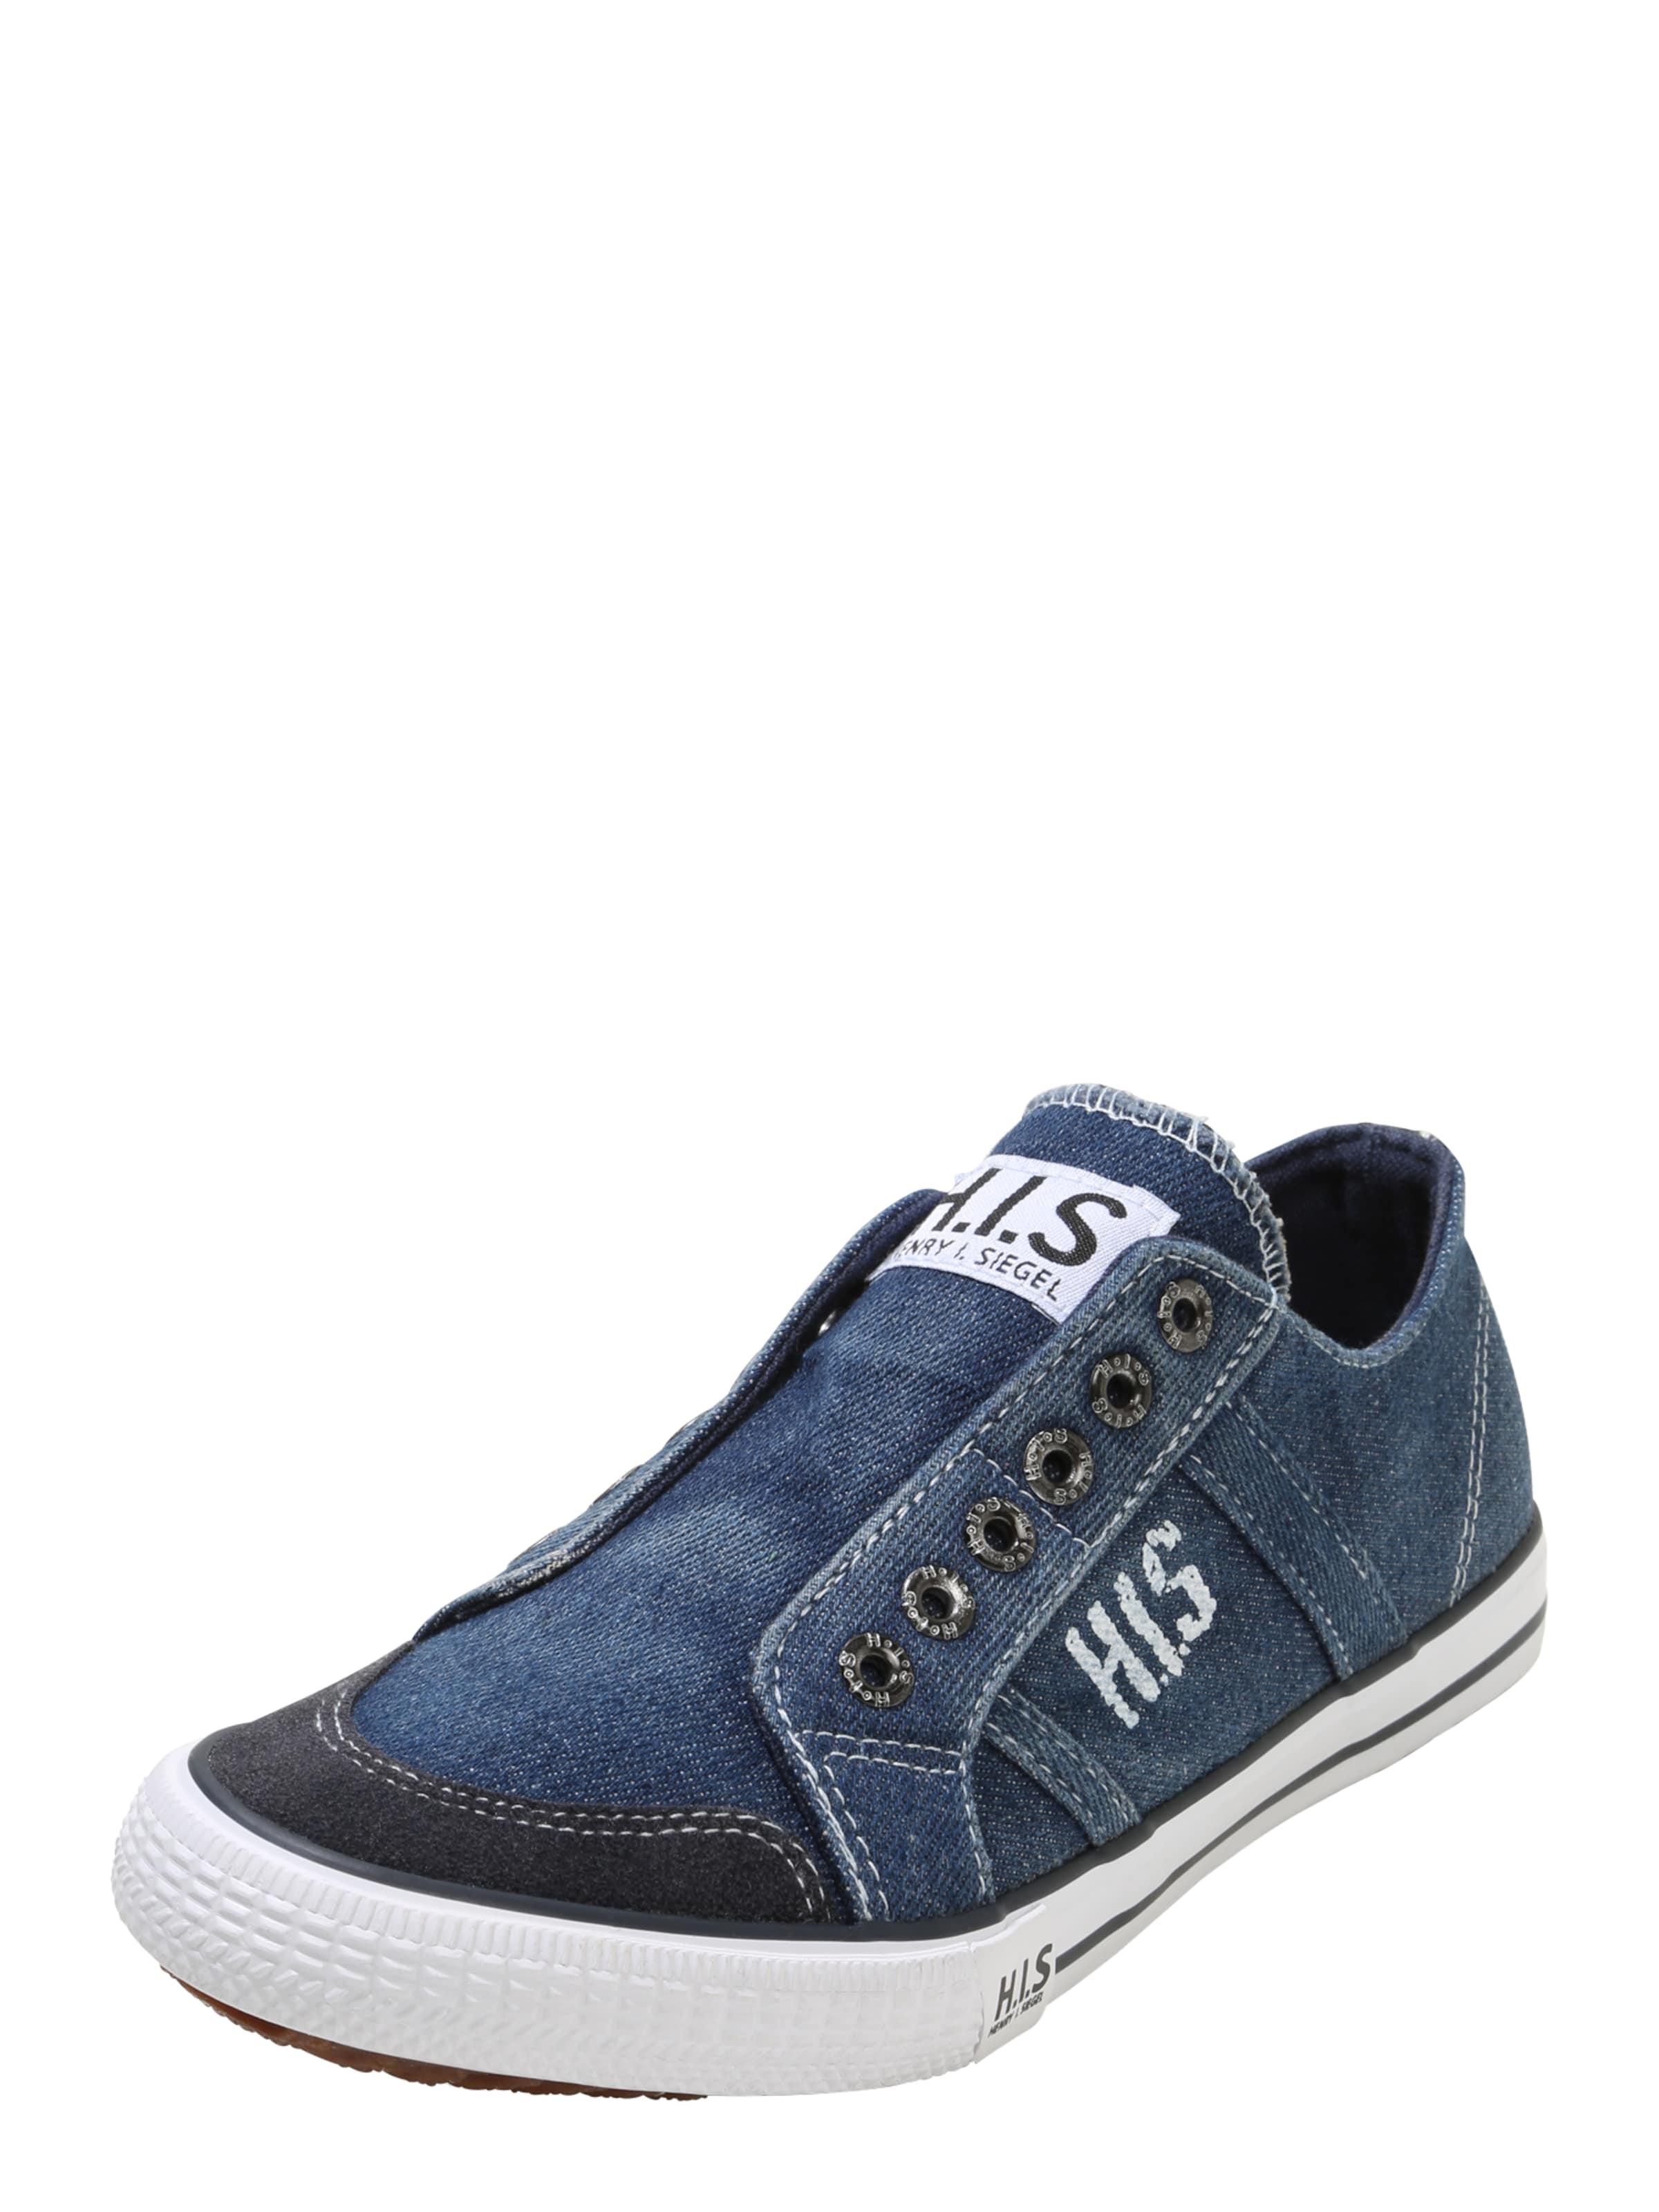 Haltbare Mode Sneaker billige Schuhe H.I.S | Sneaker Mode mit Jeans-Look Schuhe Gut getragene Schuhe 0fadd1